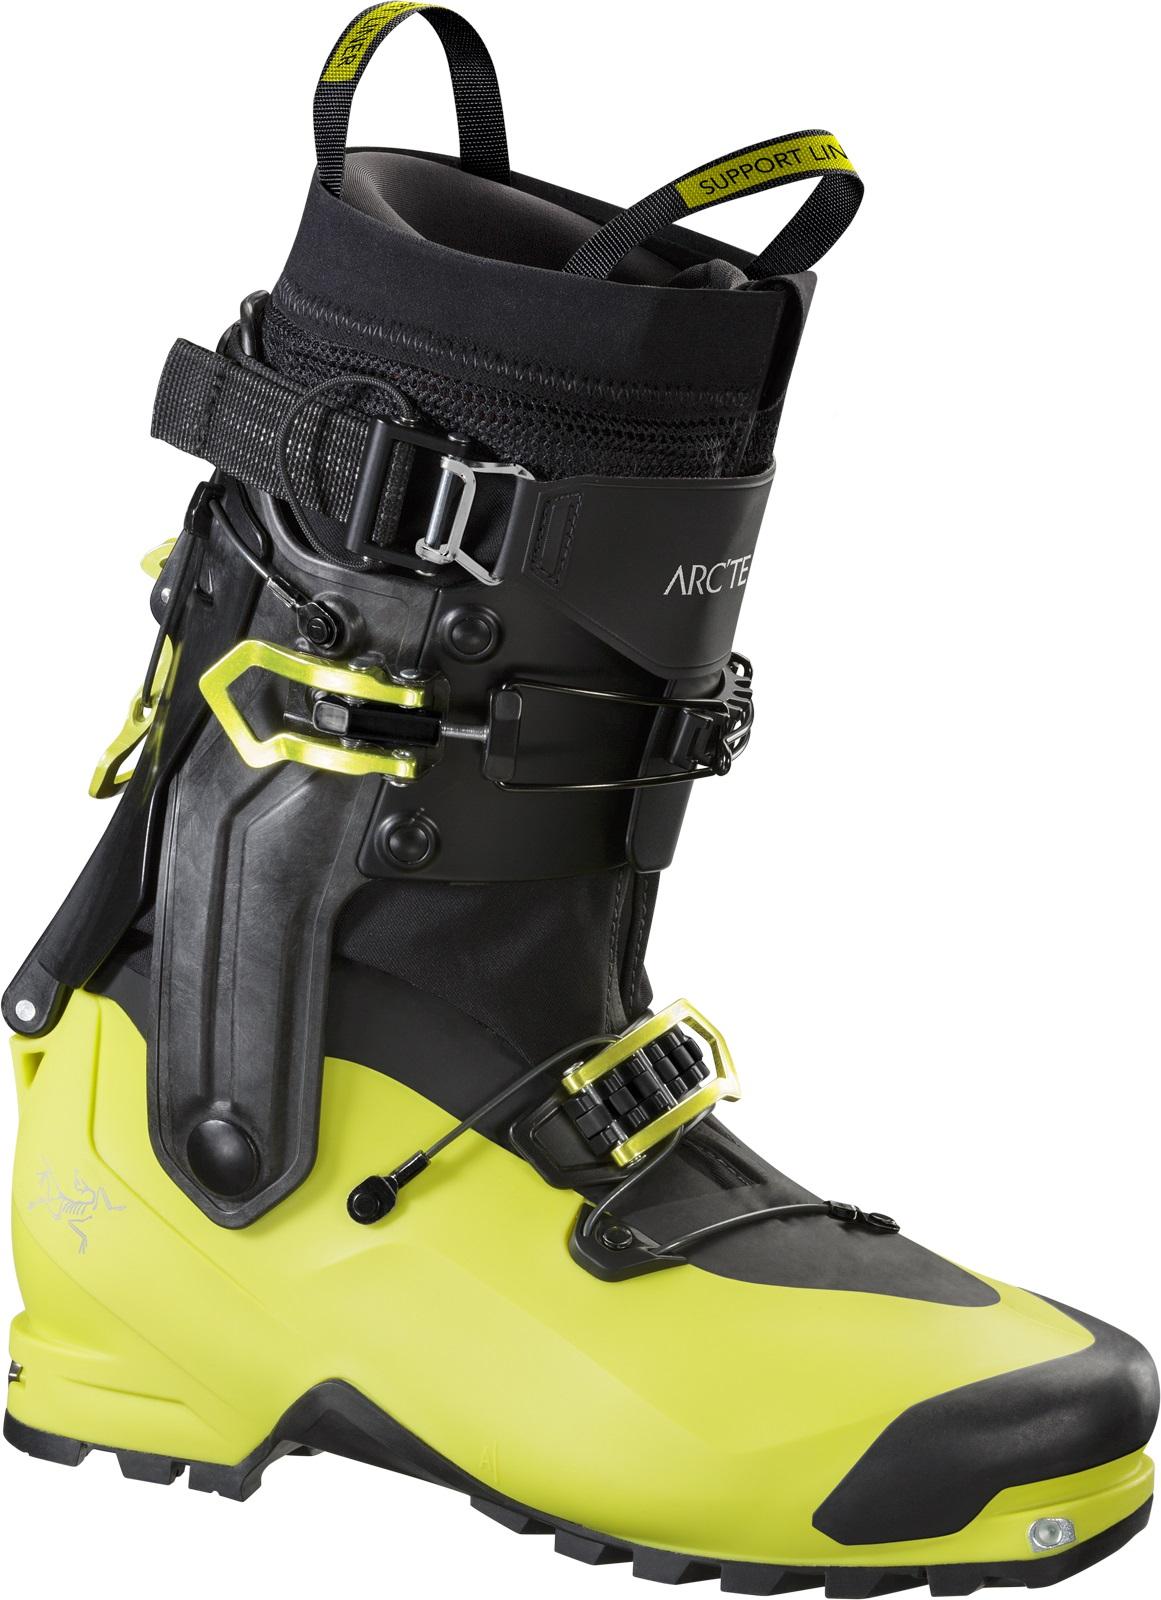 image of Arc'teryx Procline boots